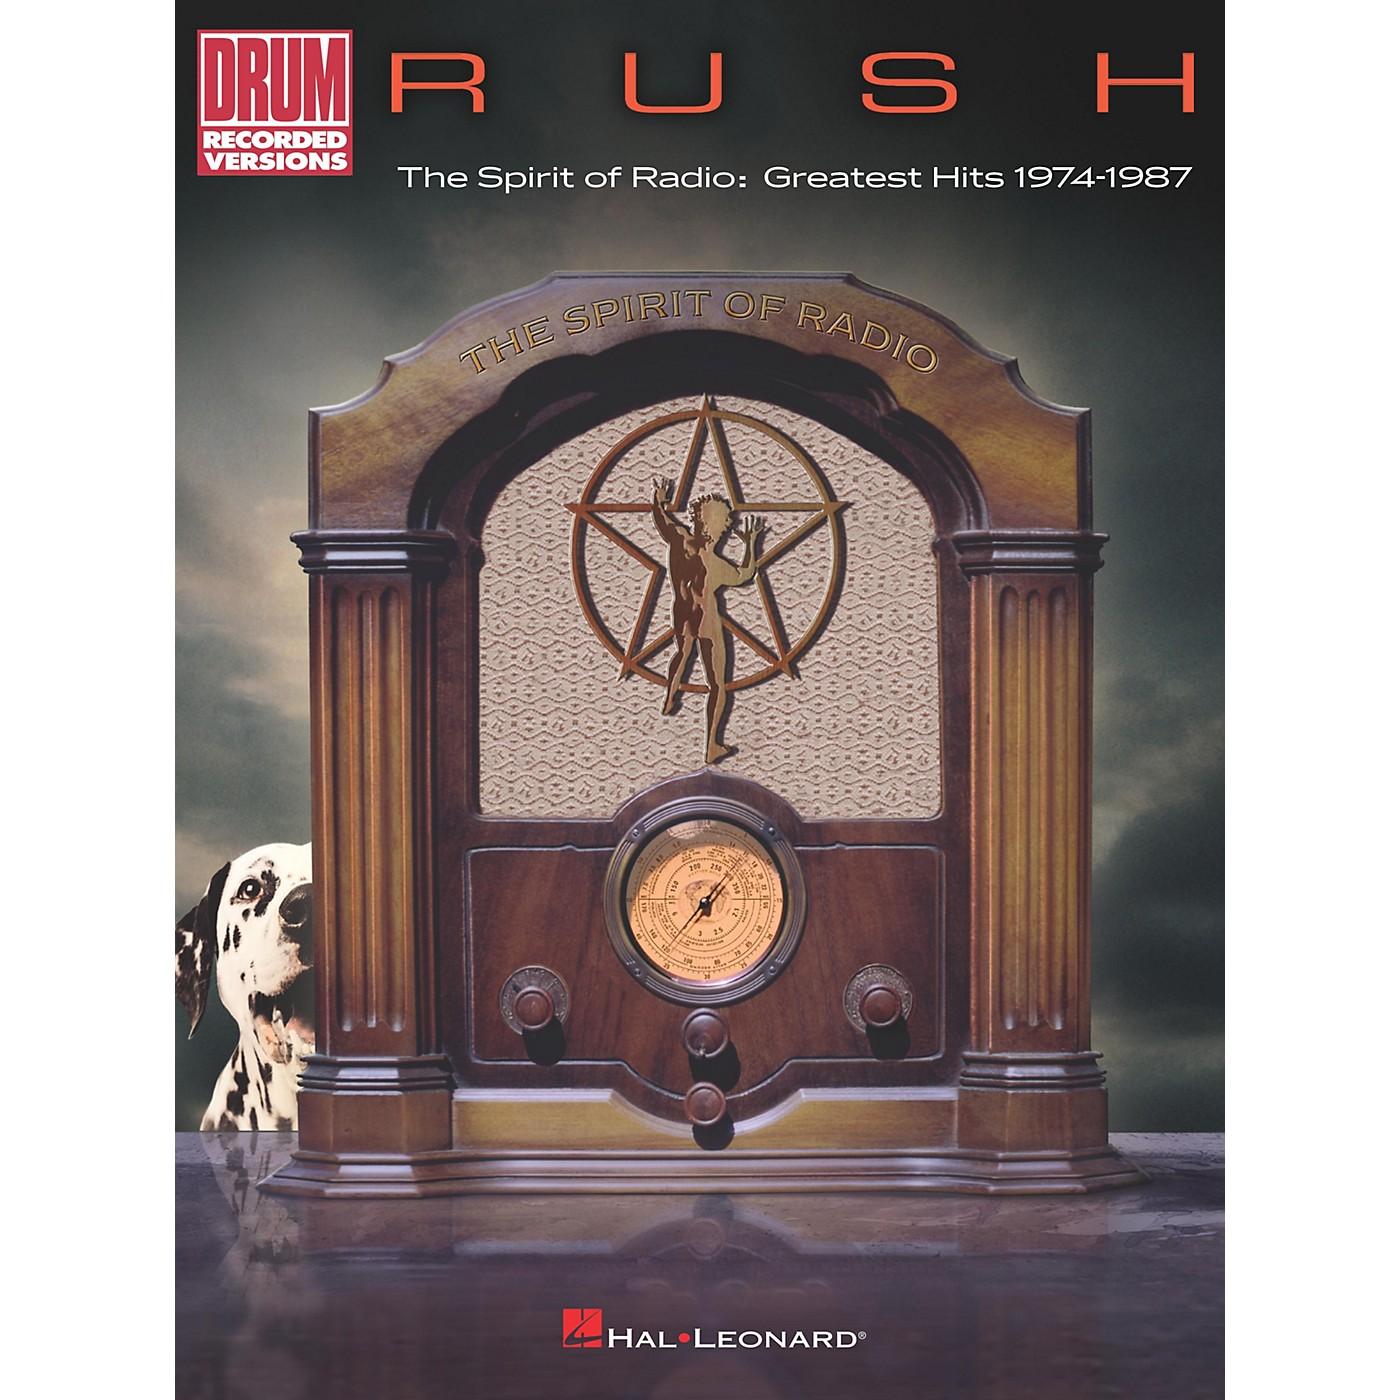 Hal Leonard Rush - The Spirit of Radio: Greatest Hits 1974-1987 Drum Transcriptions book thumbnail